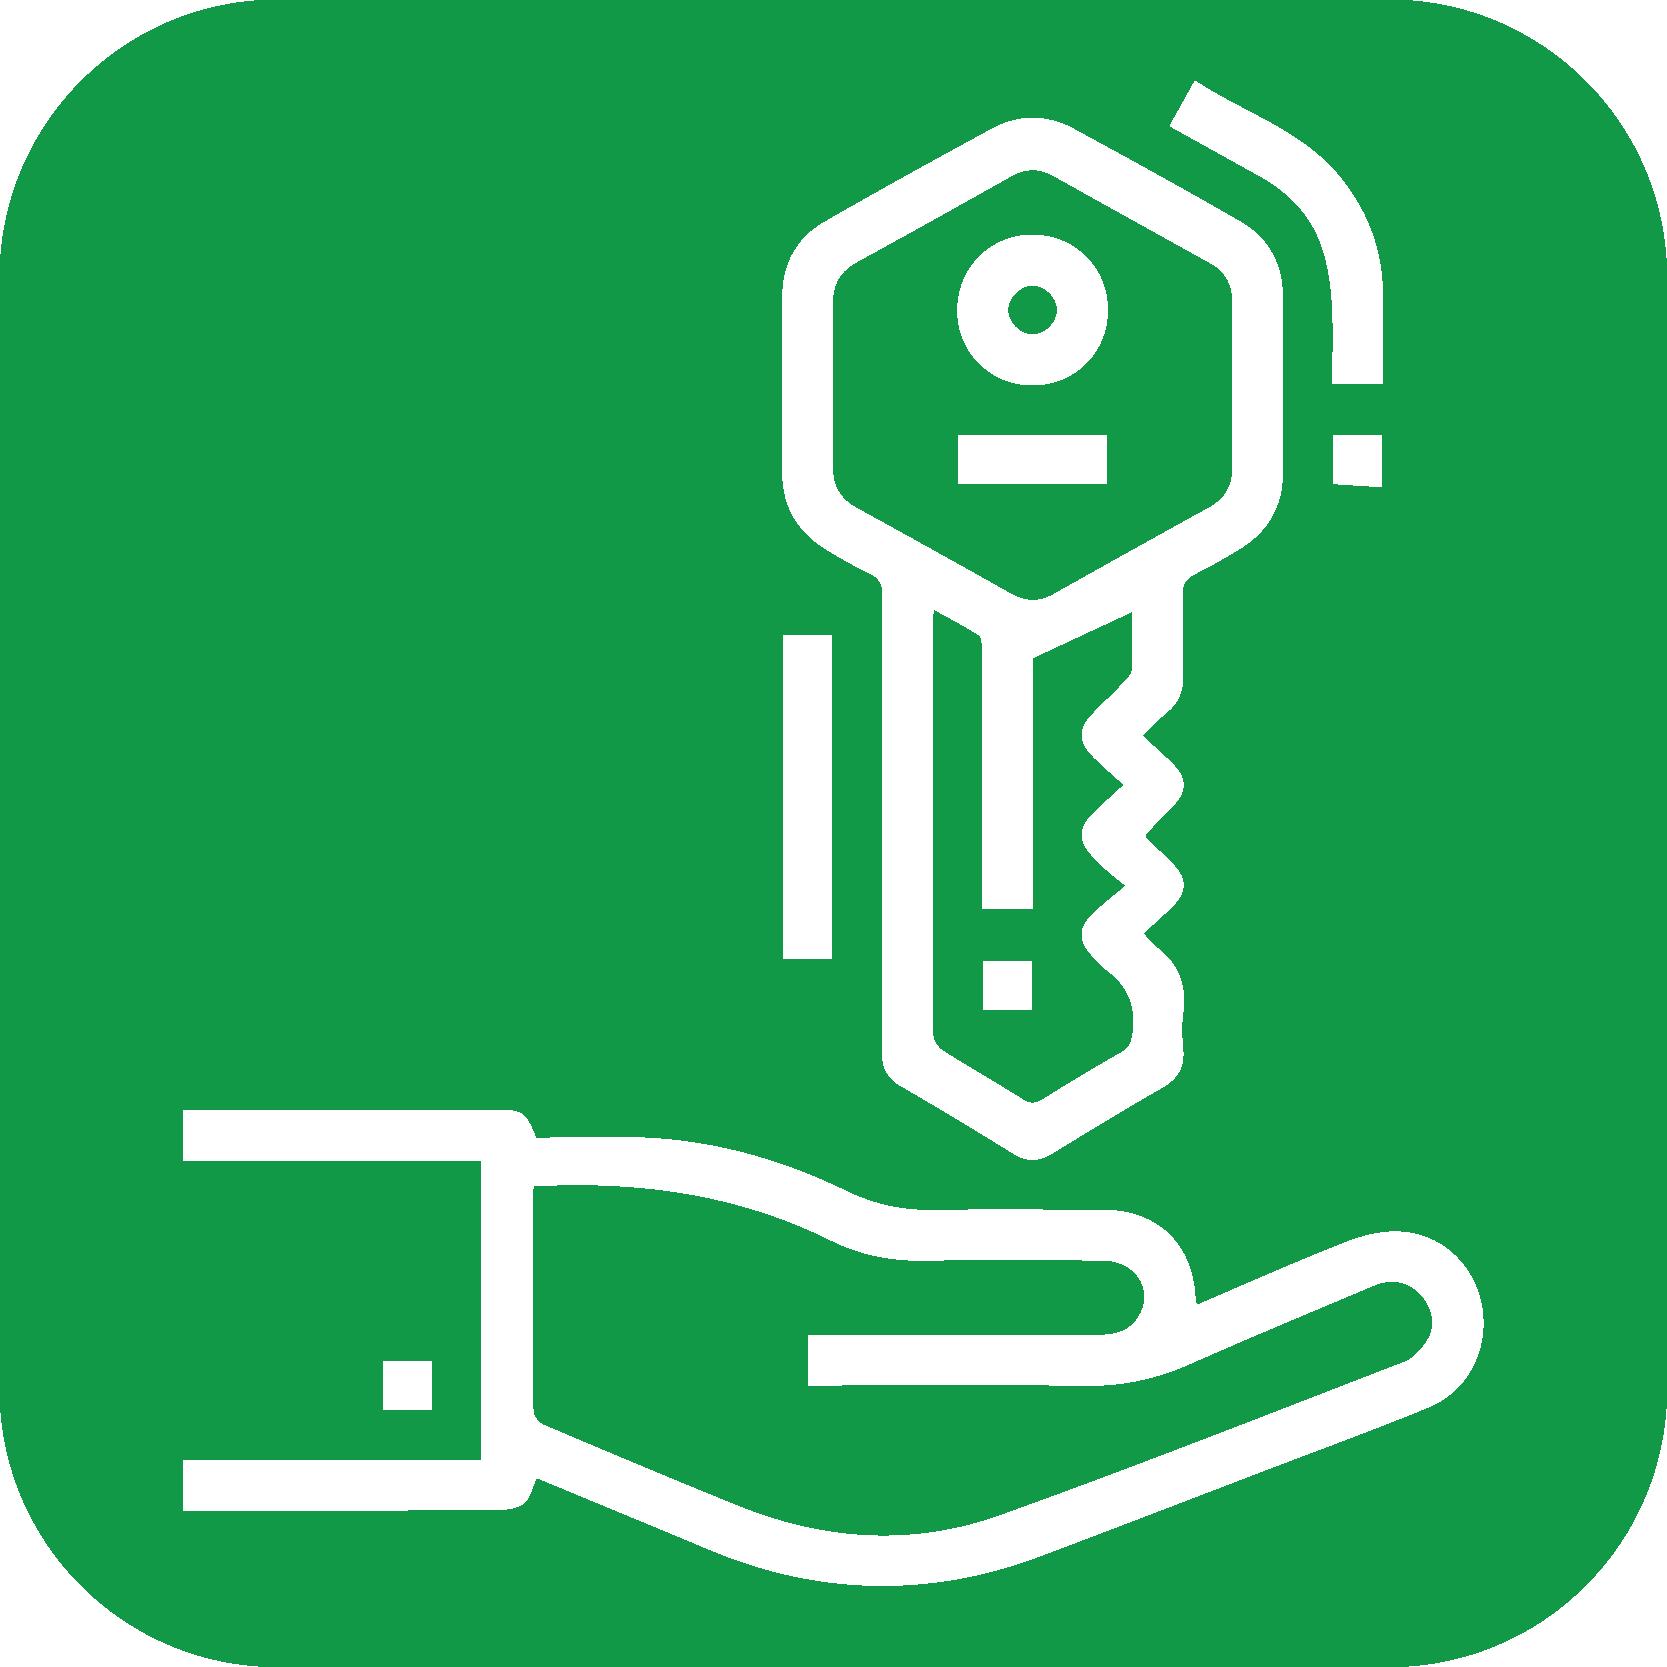 Hånd med nøgle